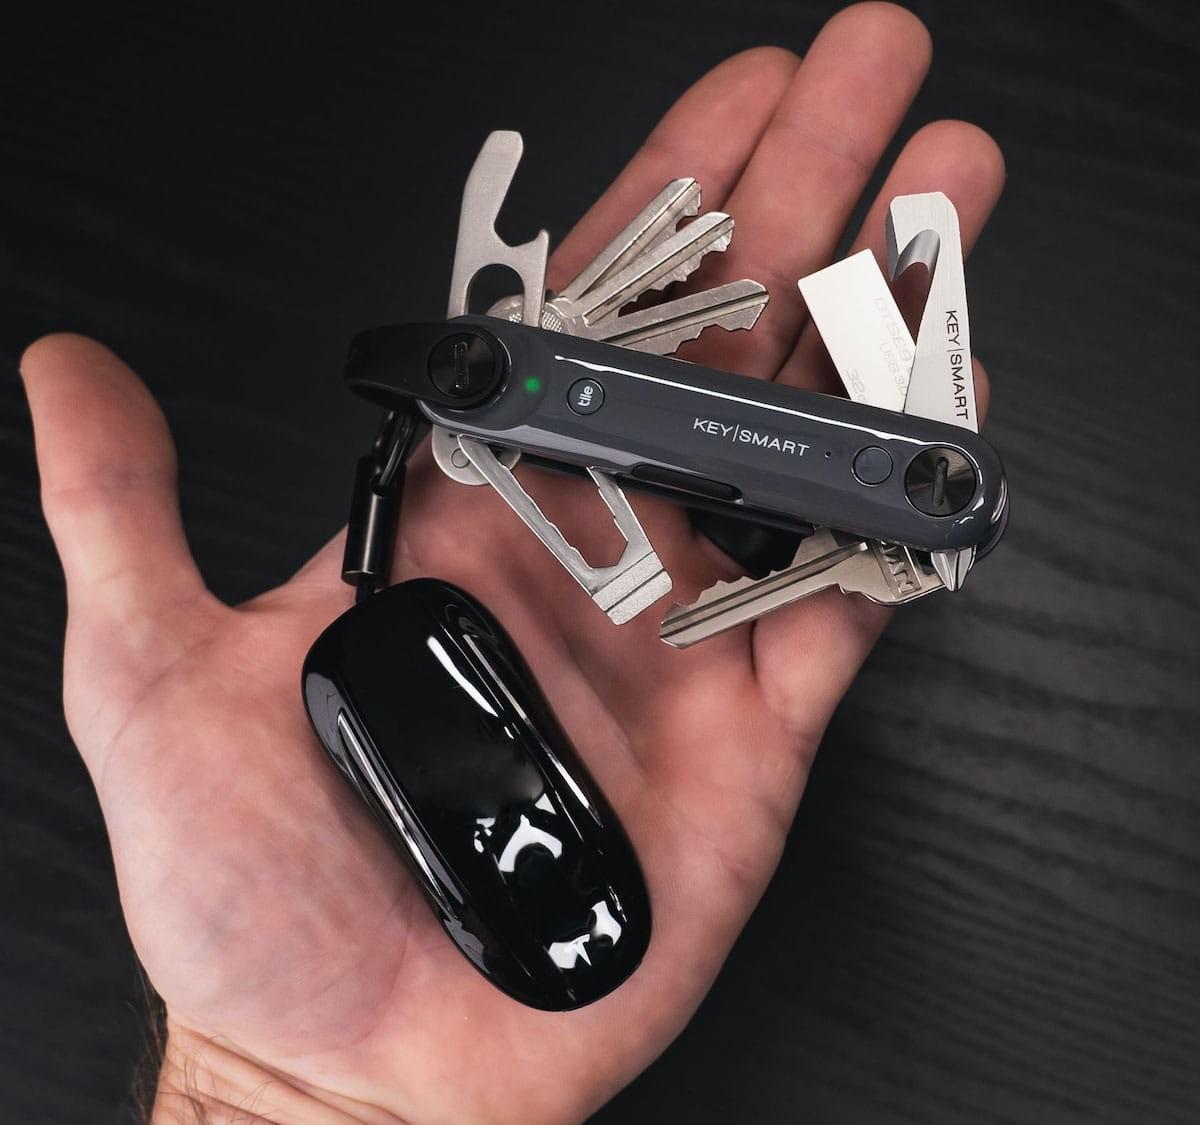 KeySmart Max smart key organizer helps you locate lost items